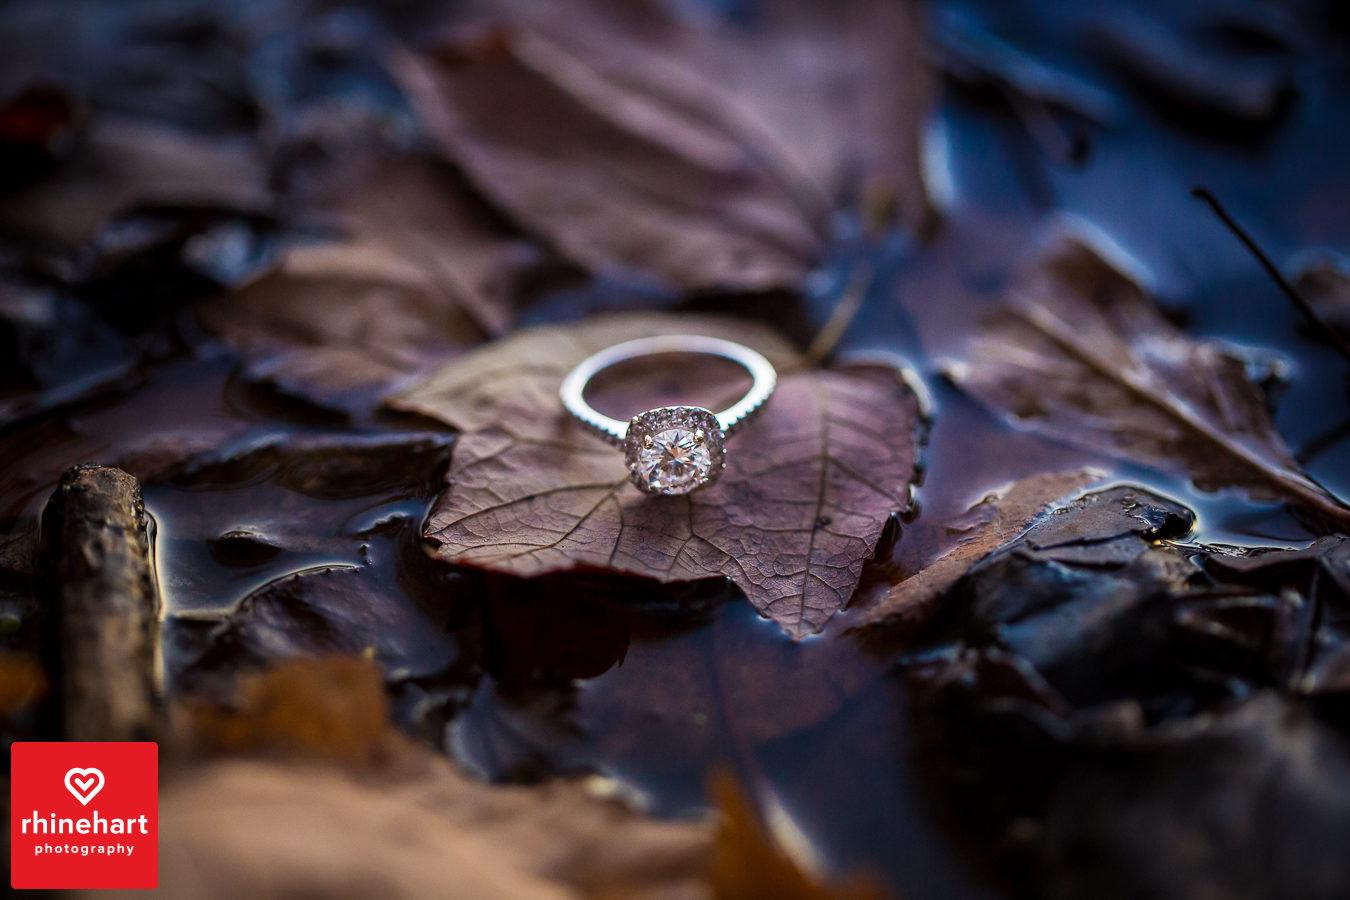 lebanon-valley-college-wedding-engagement-photographers-creative-unique-top-best-1